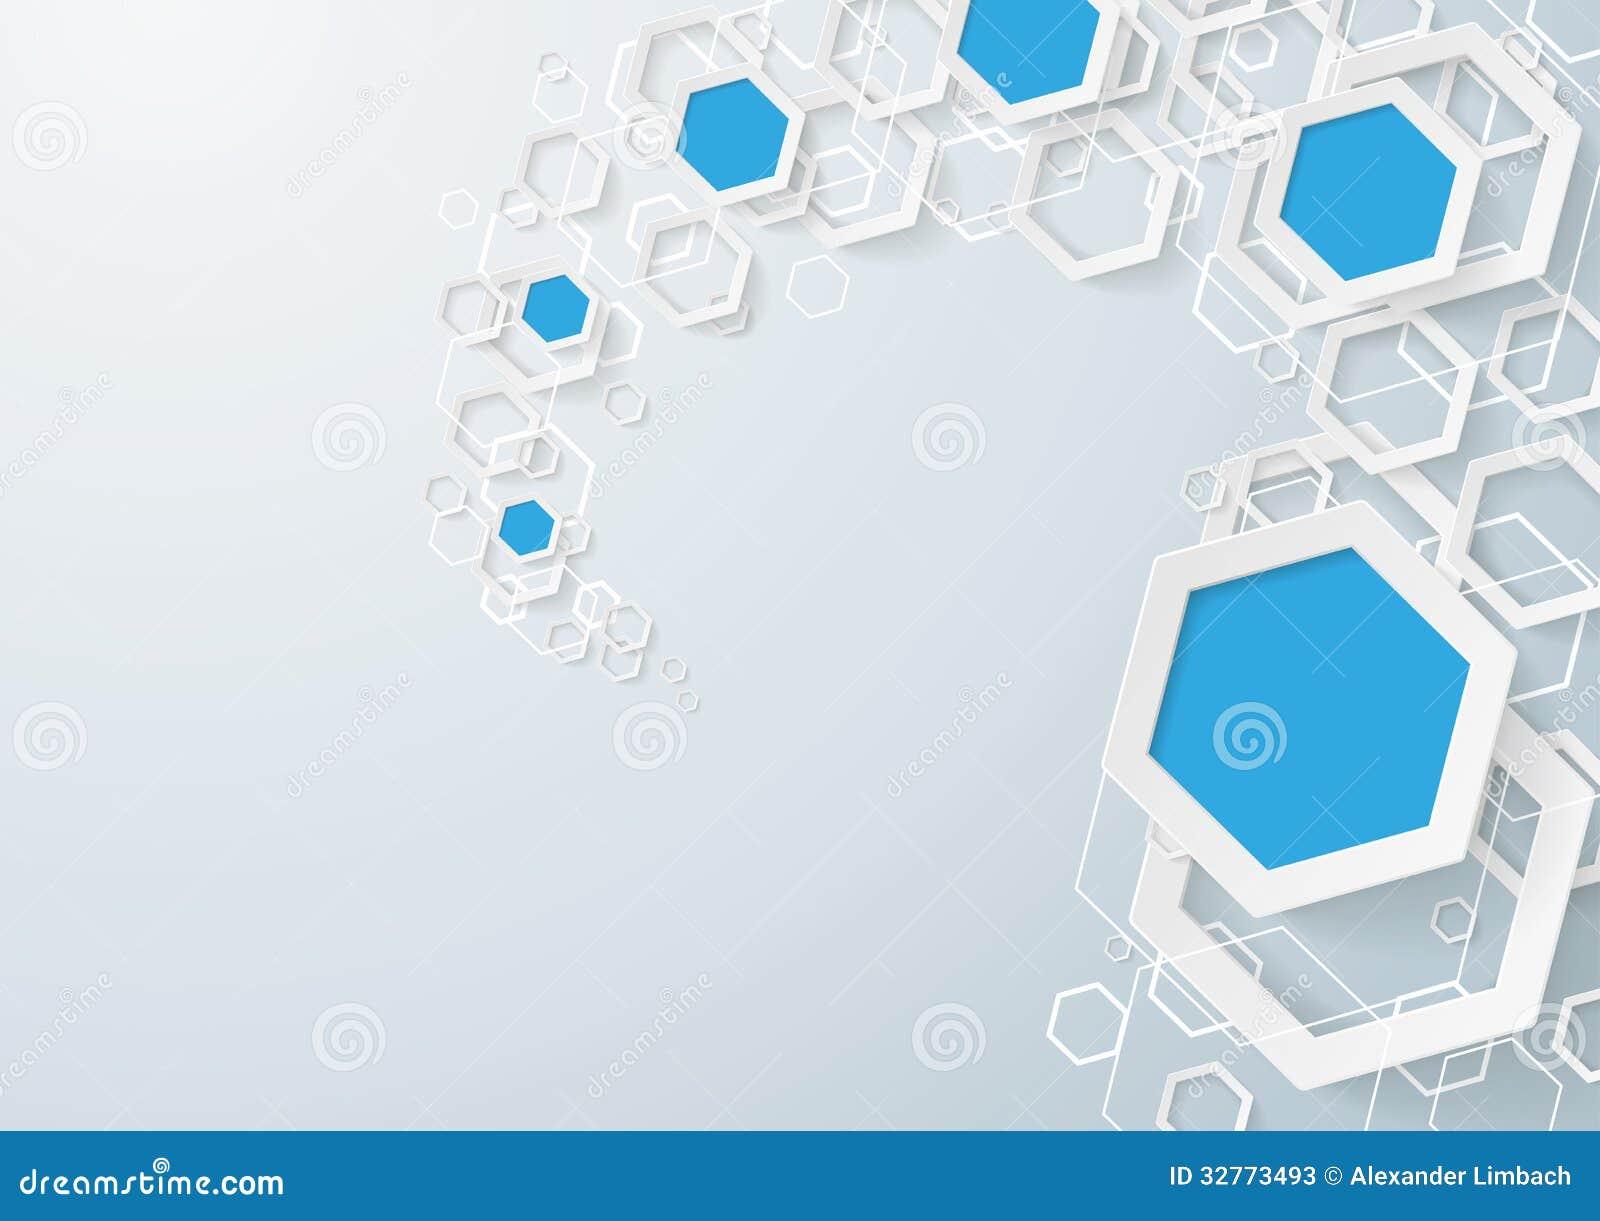 wallpaper blue hexagon white - photo #40